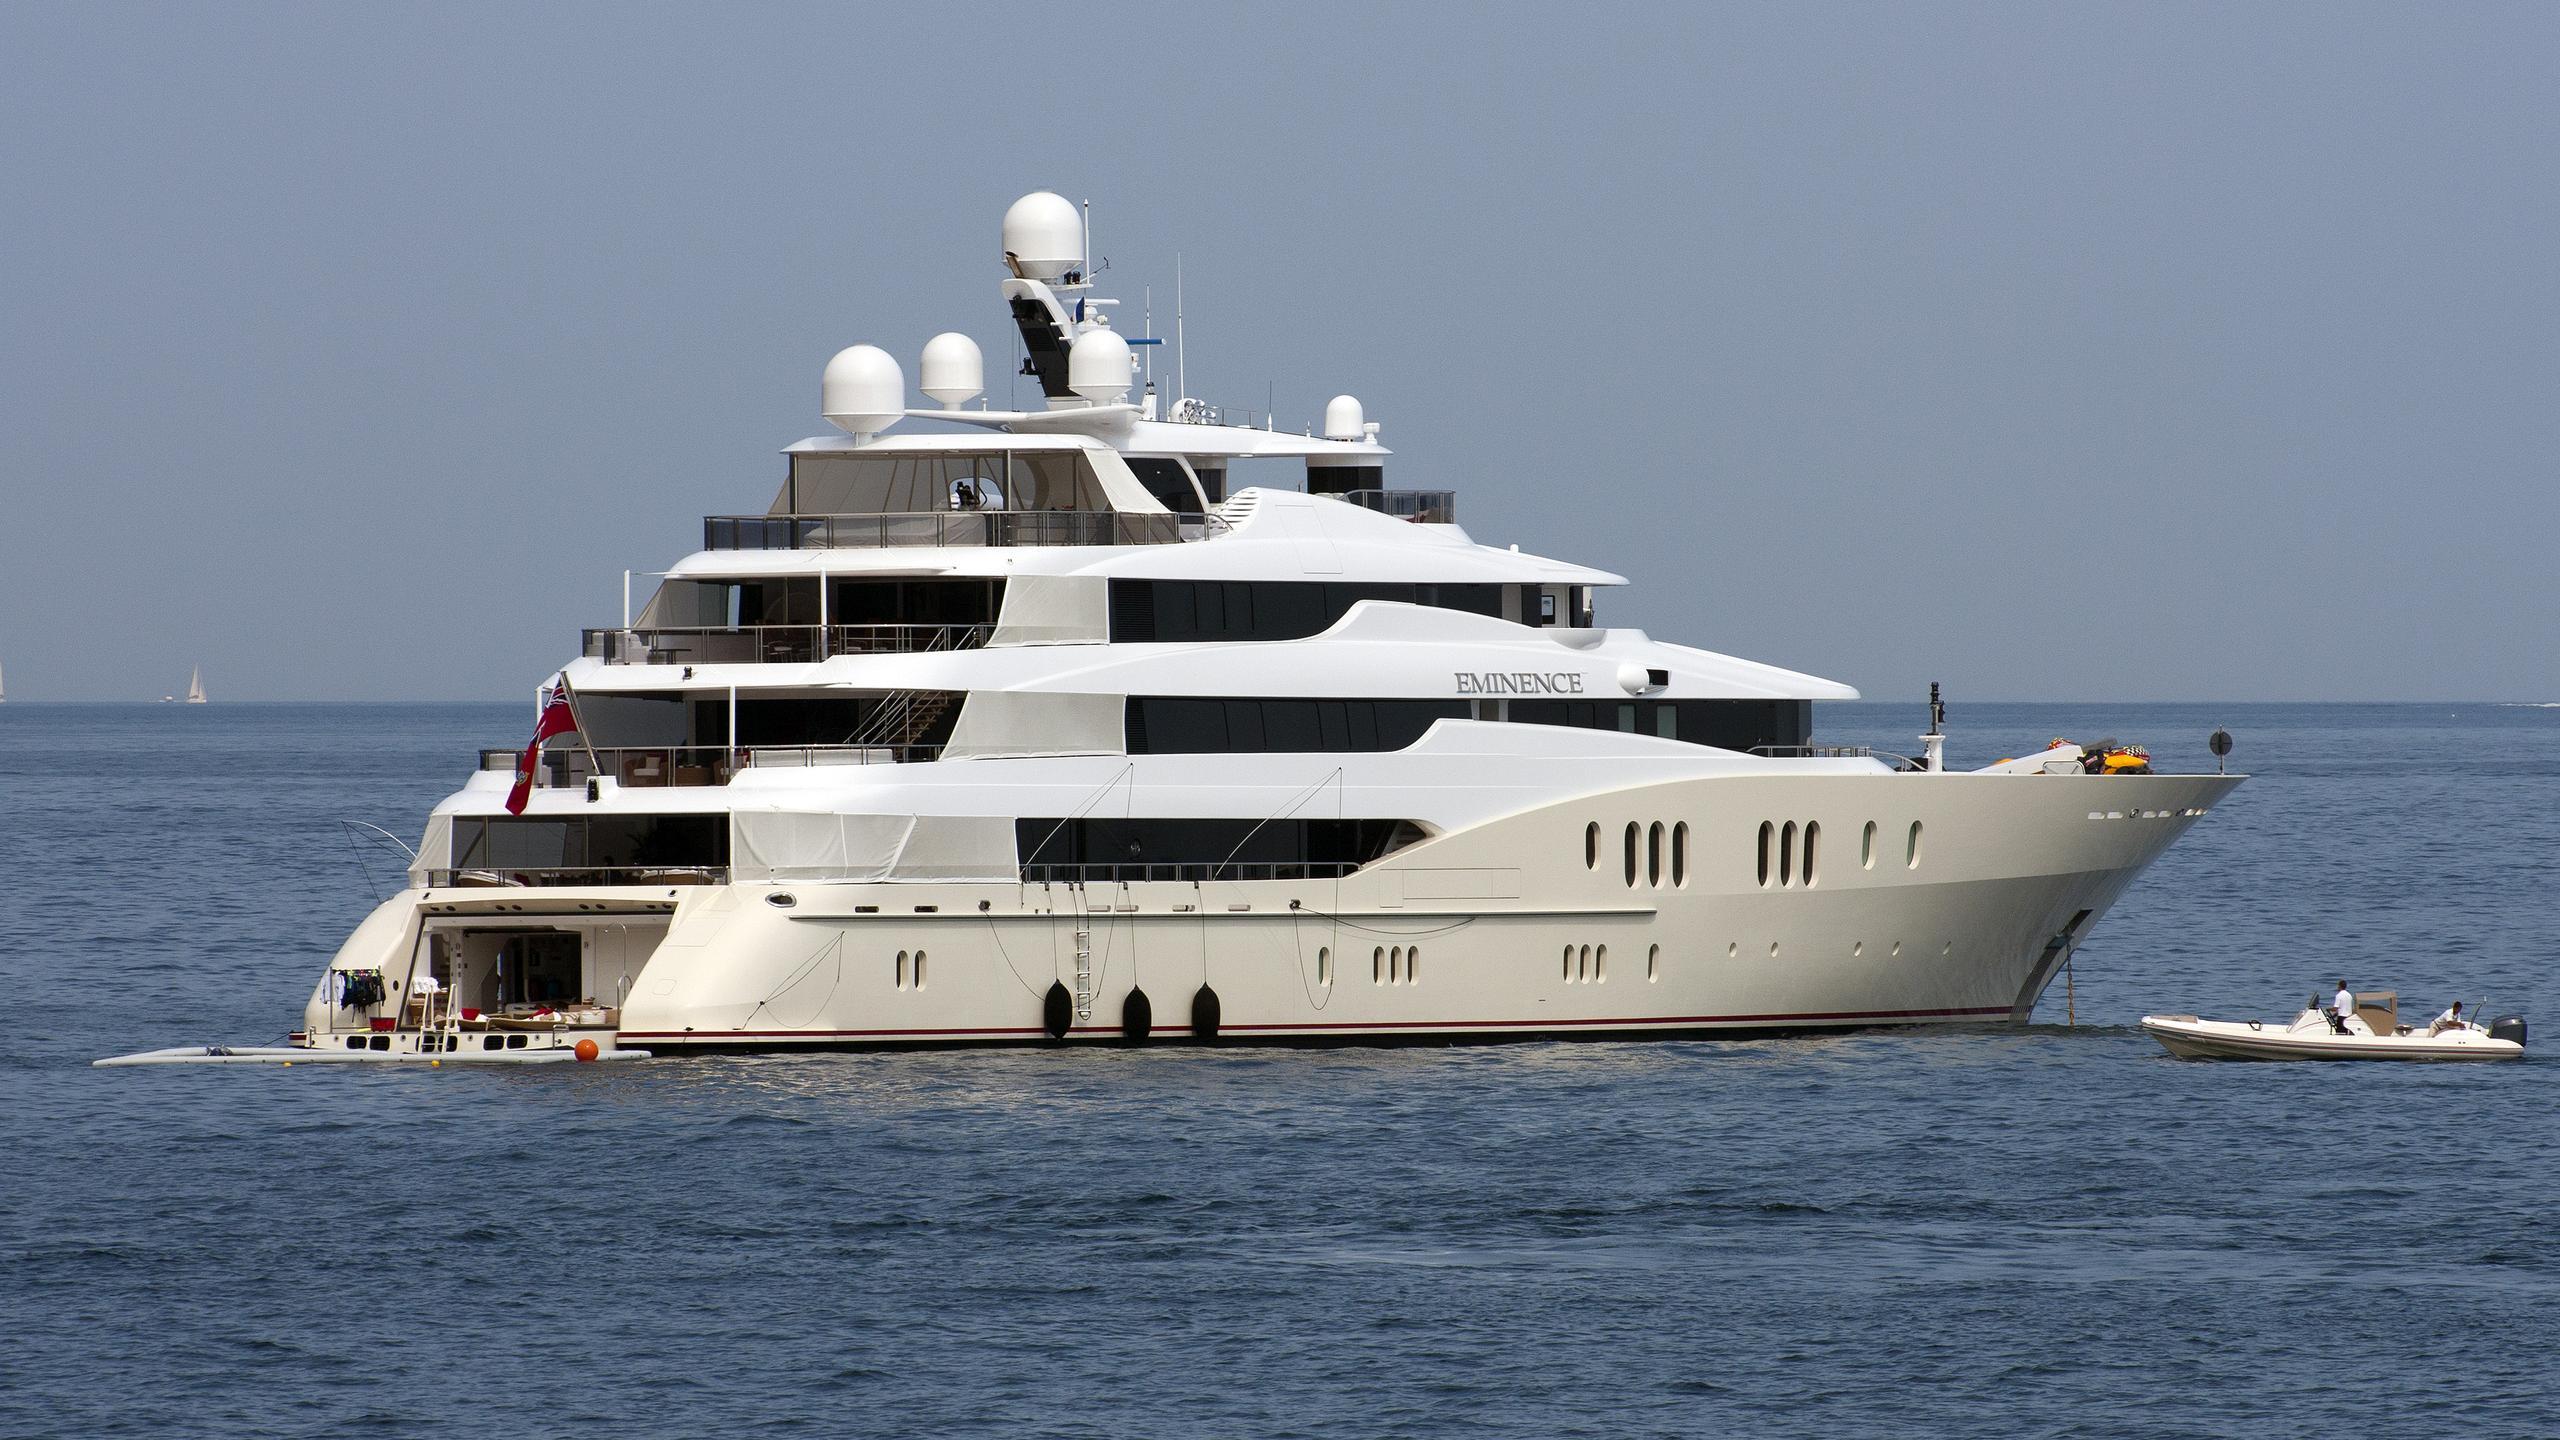 eminence-yacht-exterior